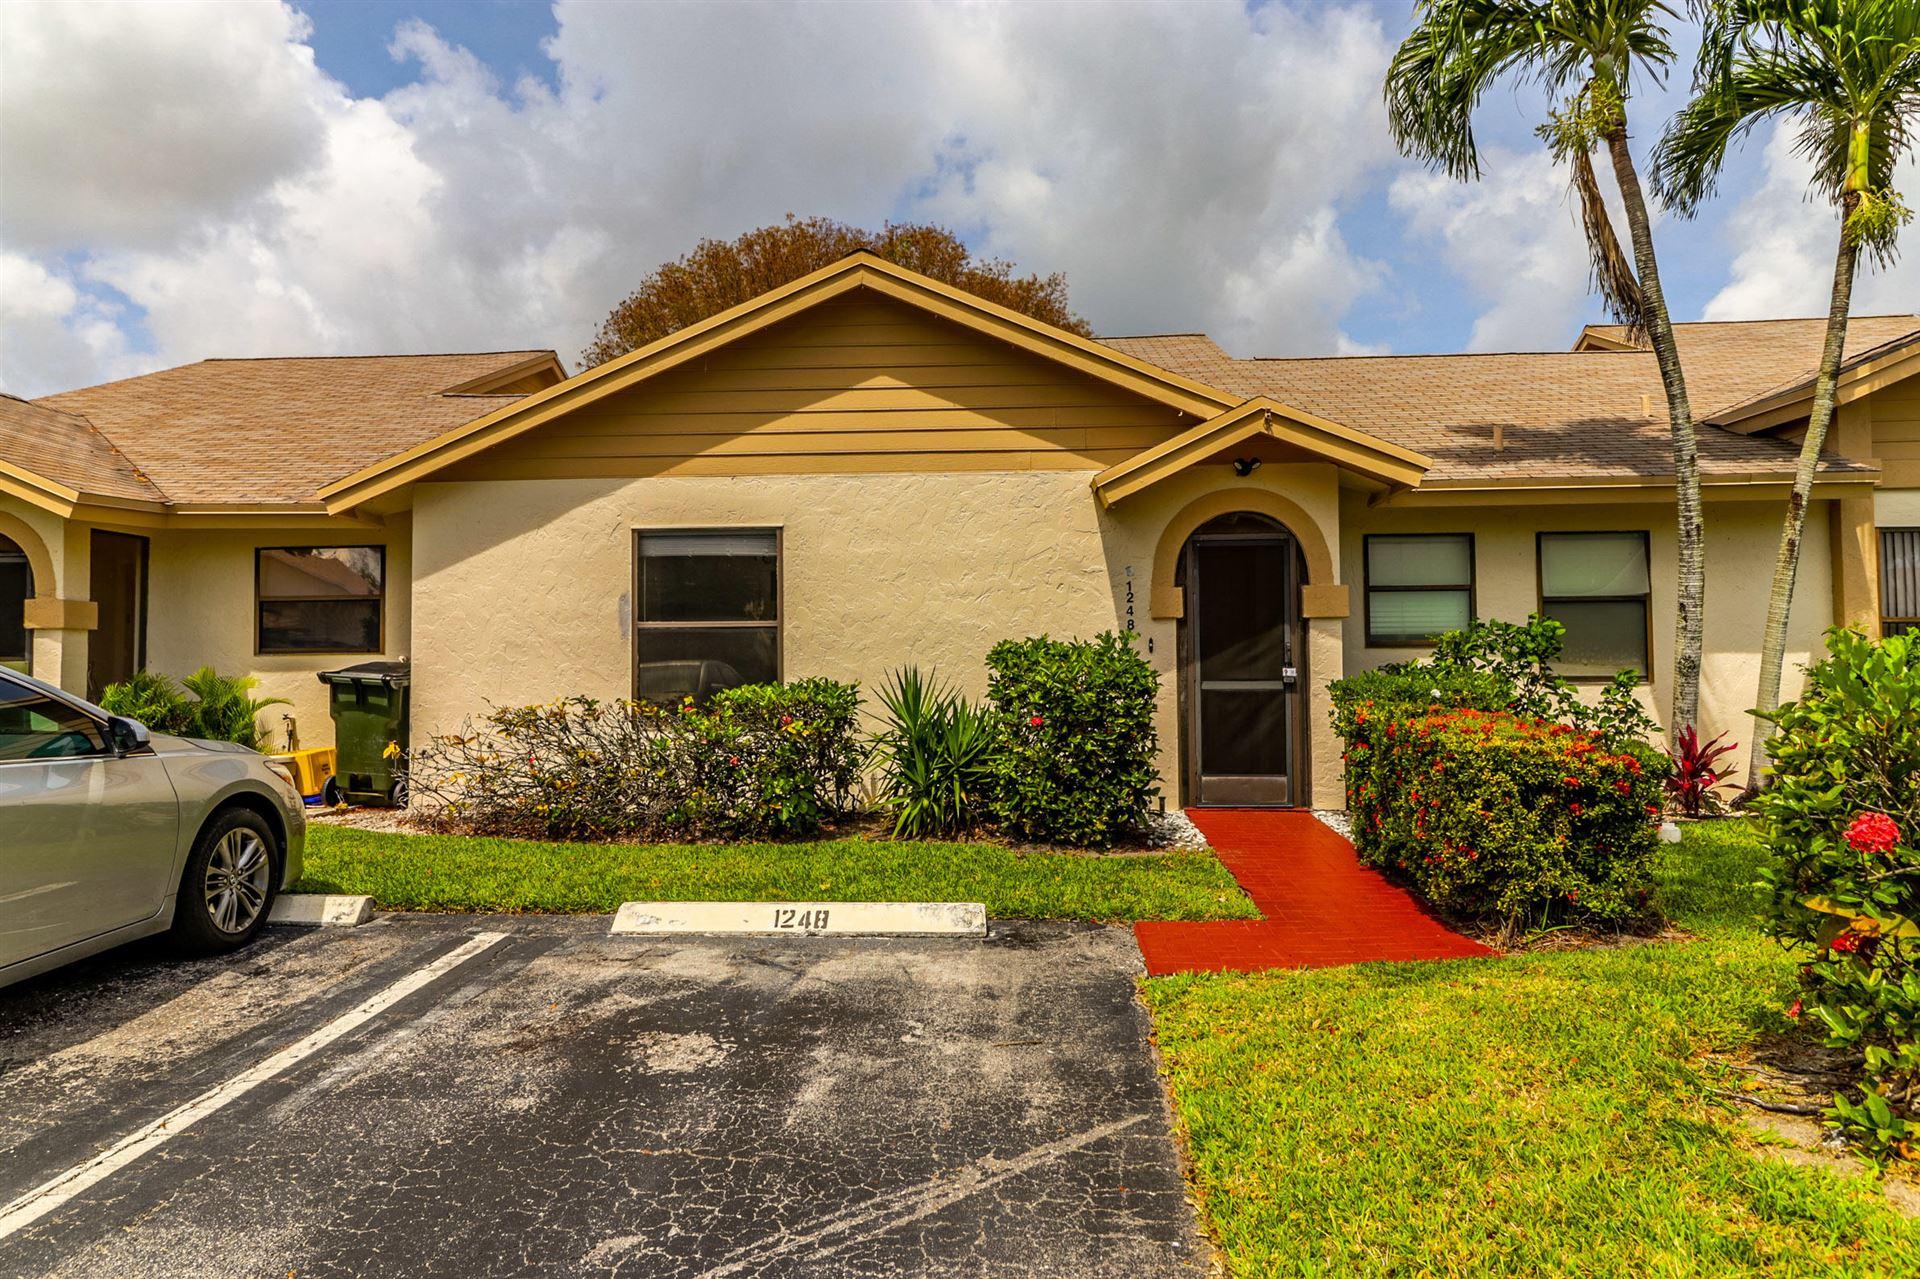 1248 NW 24th Avenue, Delray Beach, FL 33445 - #: RX-10712731